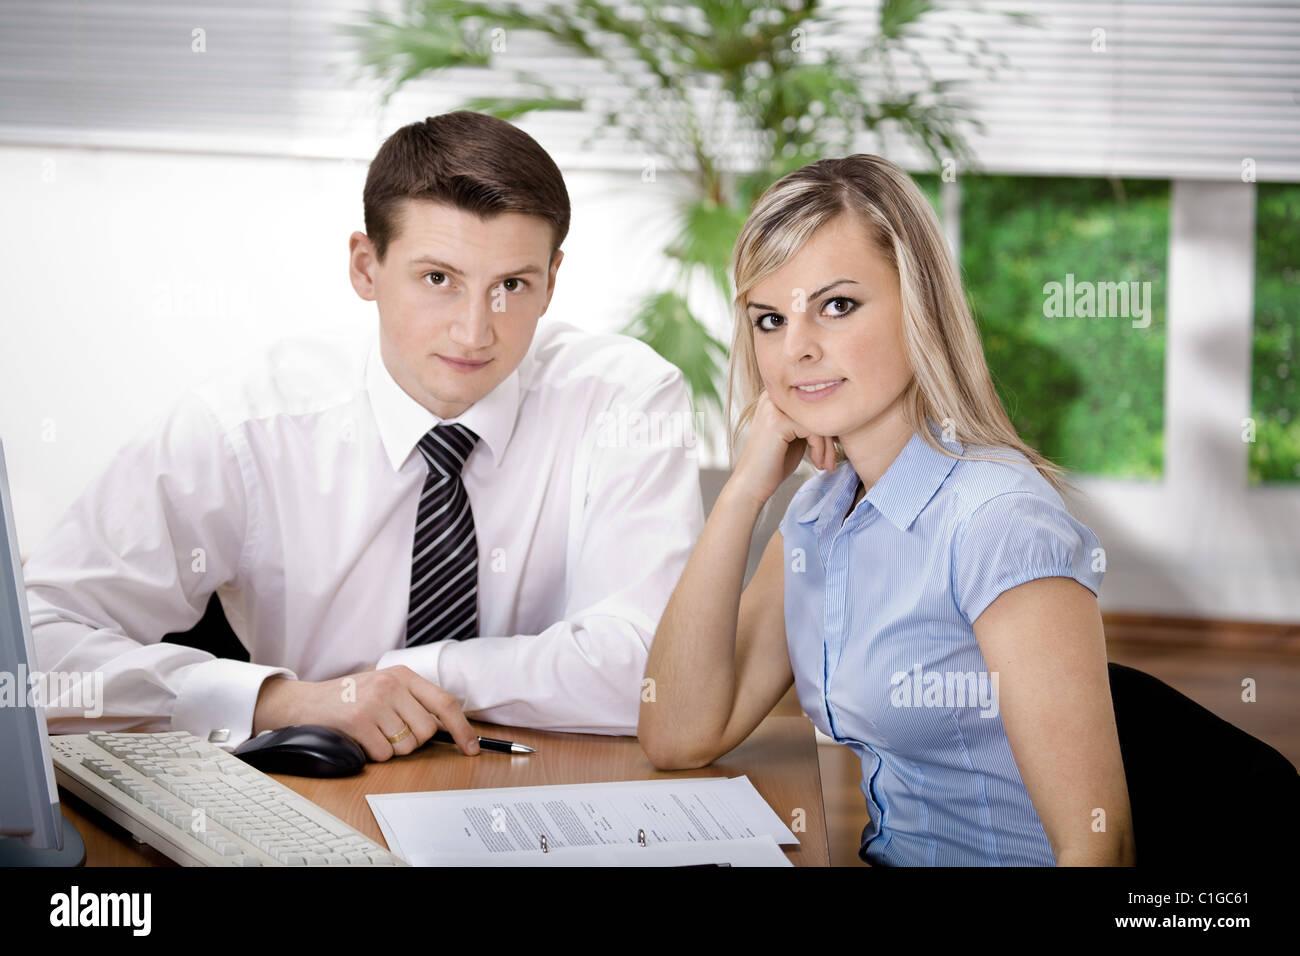 office team - Stock Image